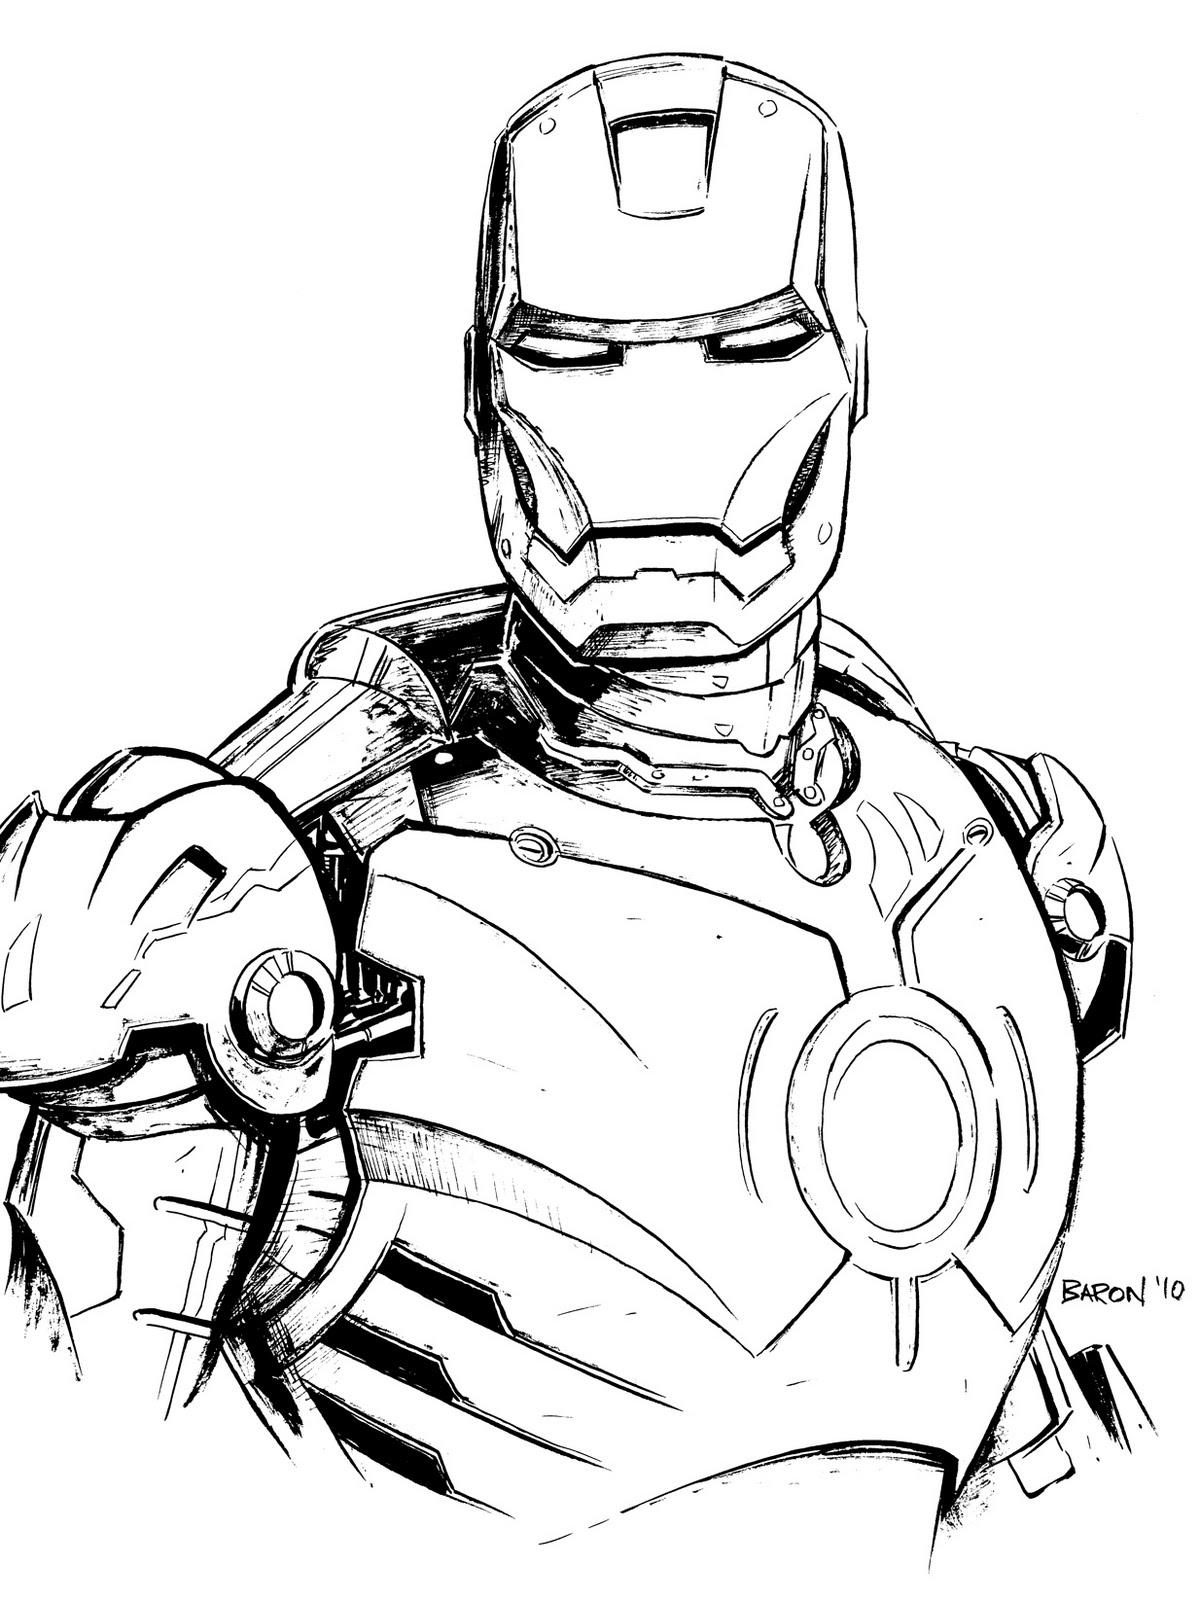 92 dibujos de Iron man para colorear | Oh Kids | Page 6